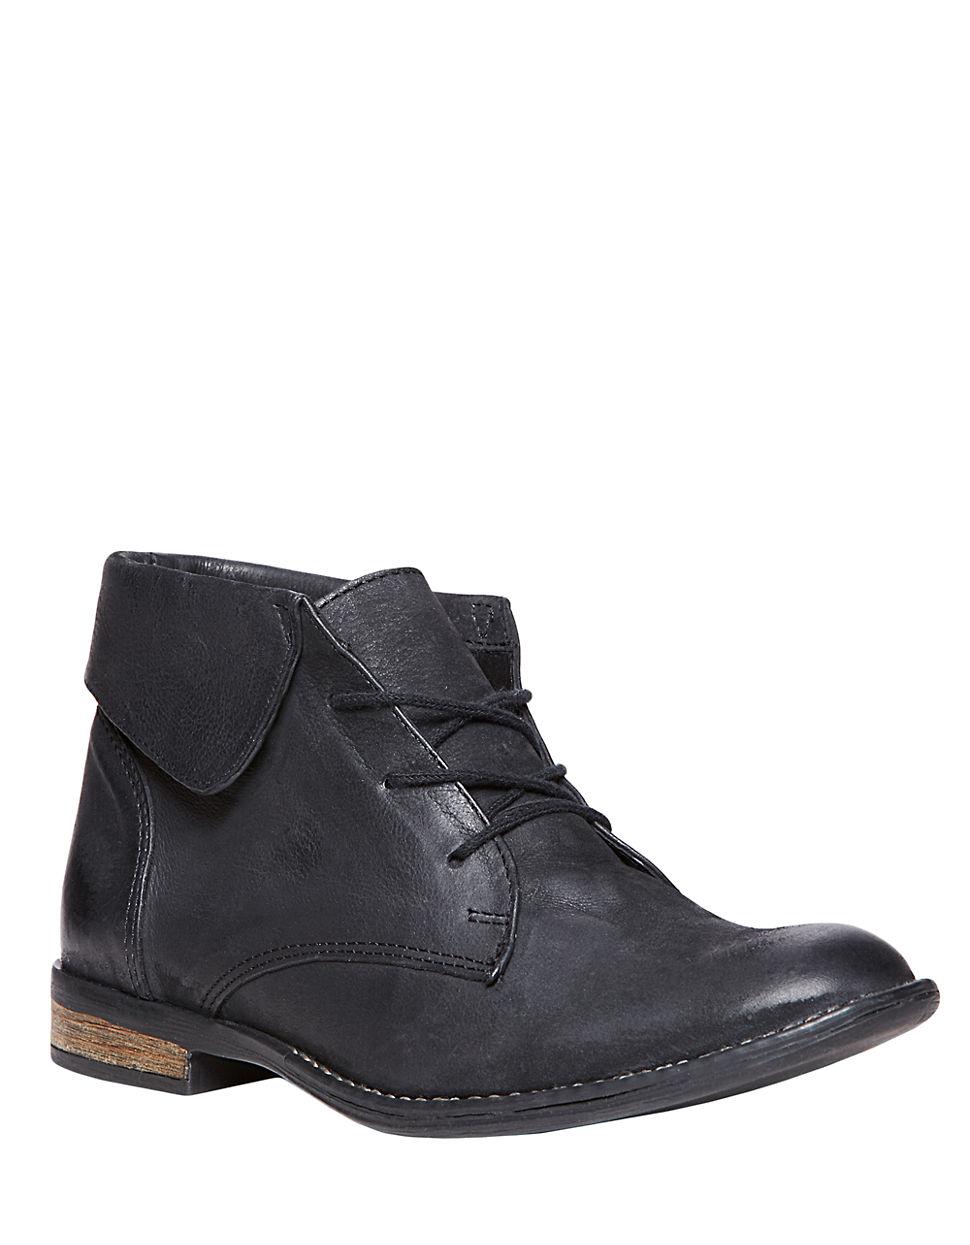 steve madden stringrei leather ankle boots in black lyst